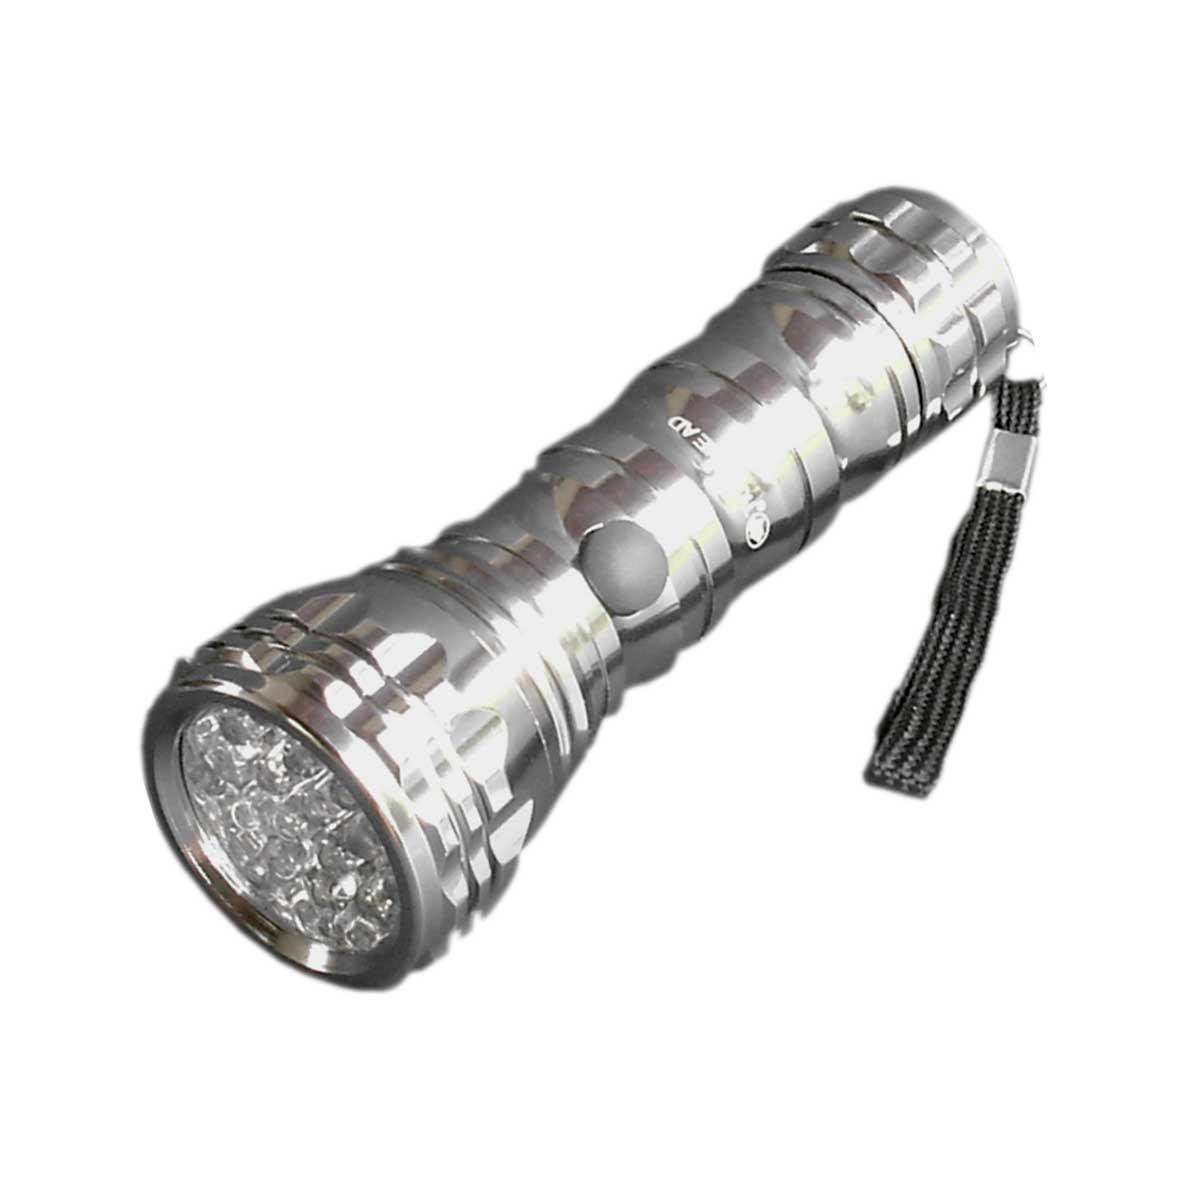 CSRLEDS19 - Lanterna de Alumínio 19 LEDs CSR LED S19 - CSR